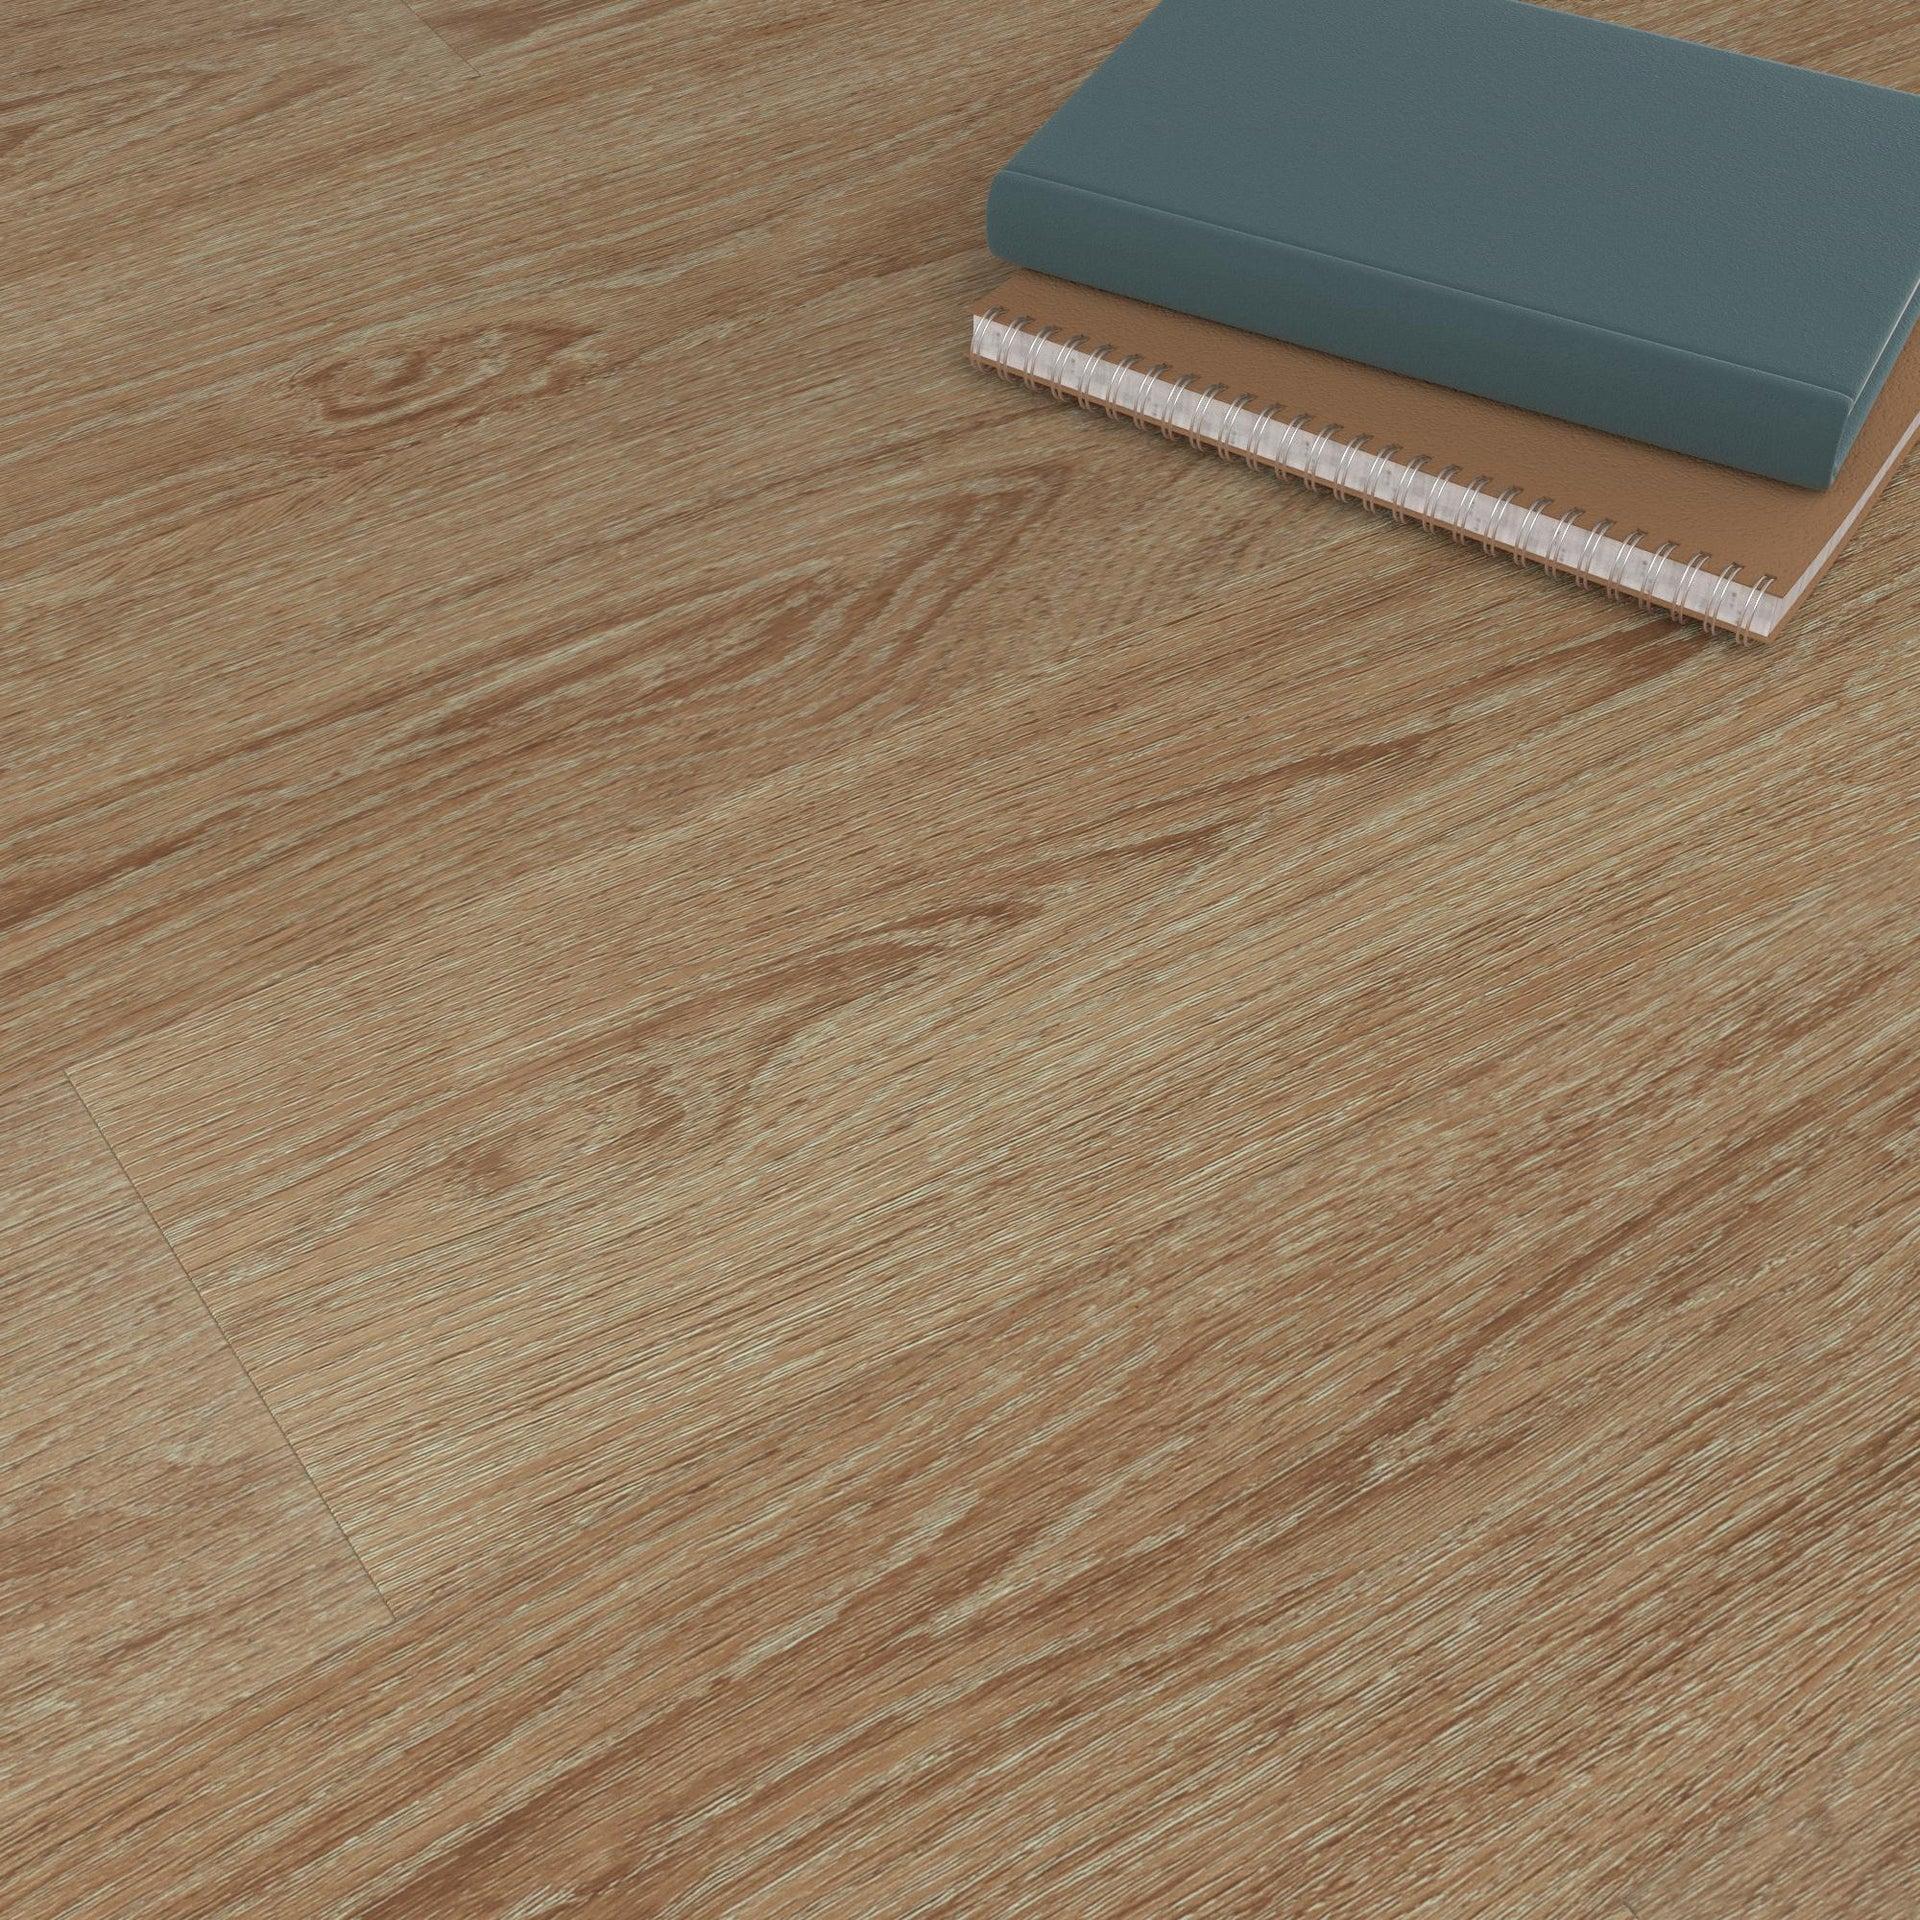 Pavimento PVC adesivo Sadema Sp 2 mm beige - 3